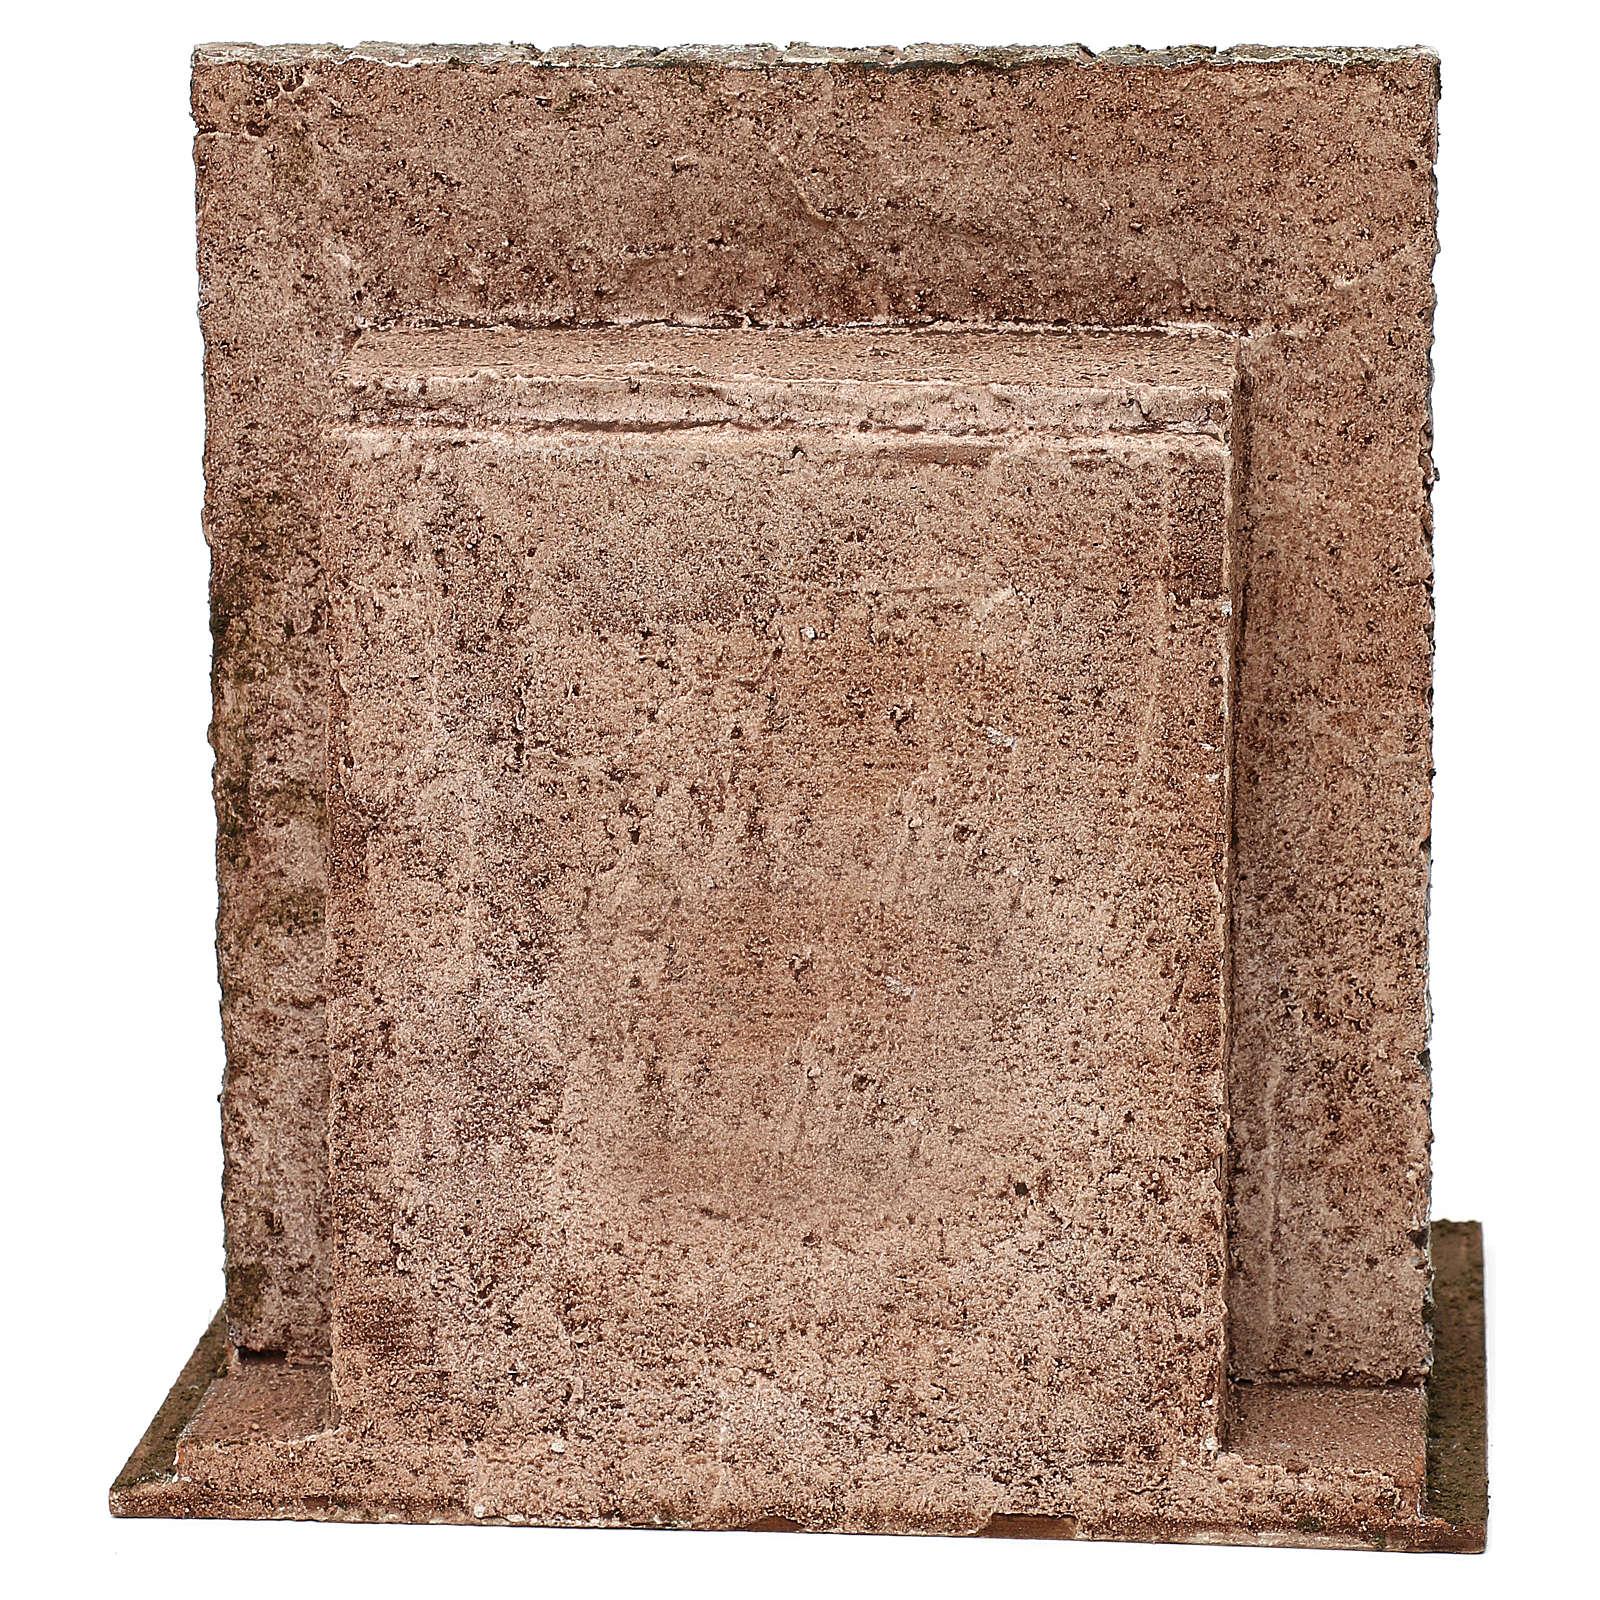 Maccheronaio presepe 12 cm ambientazione 25x25x20 cm 4